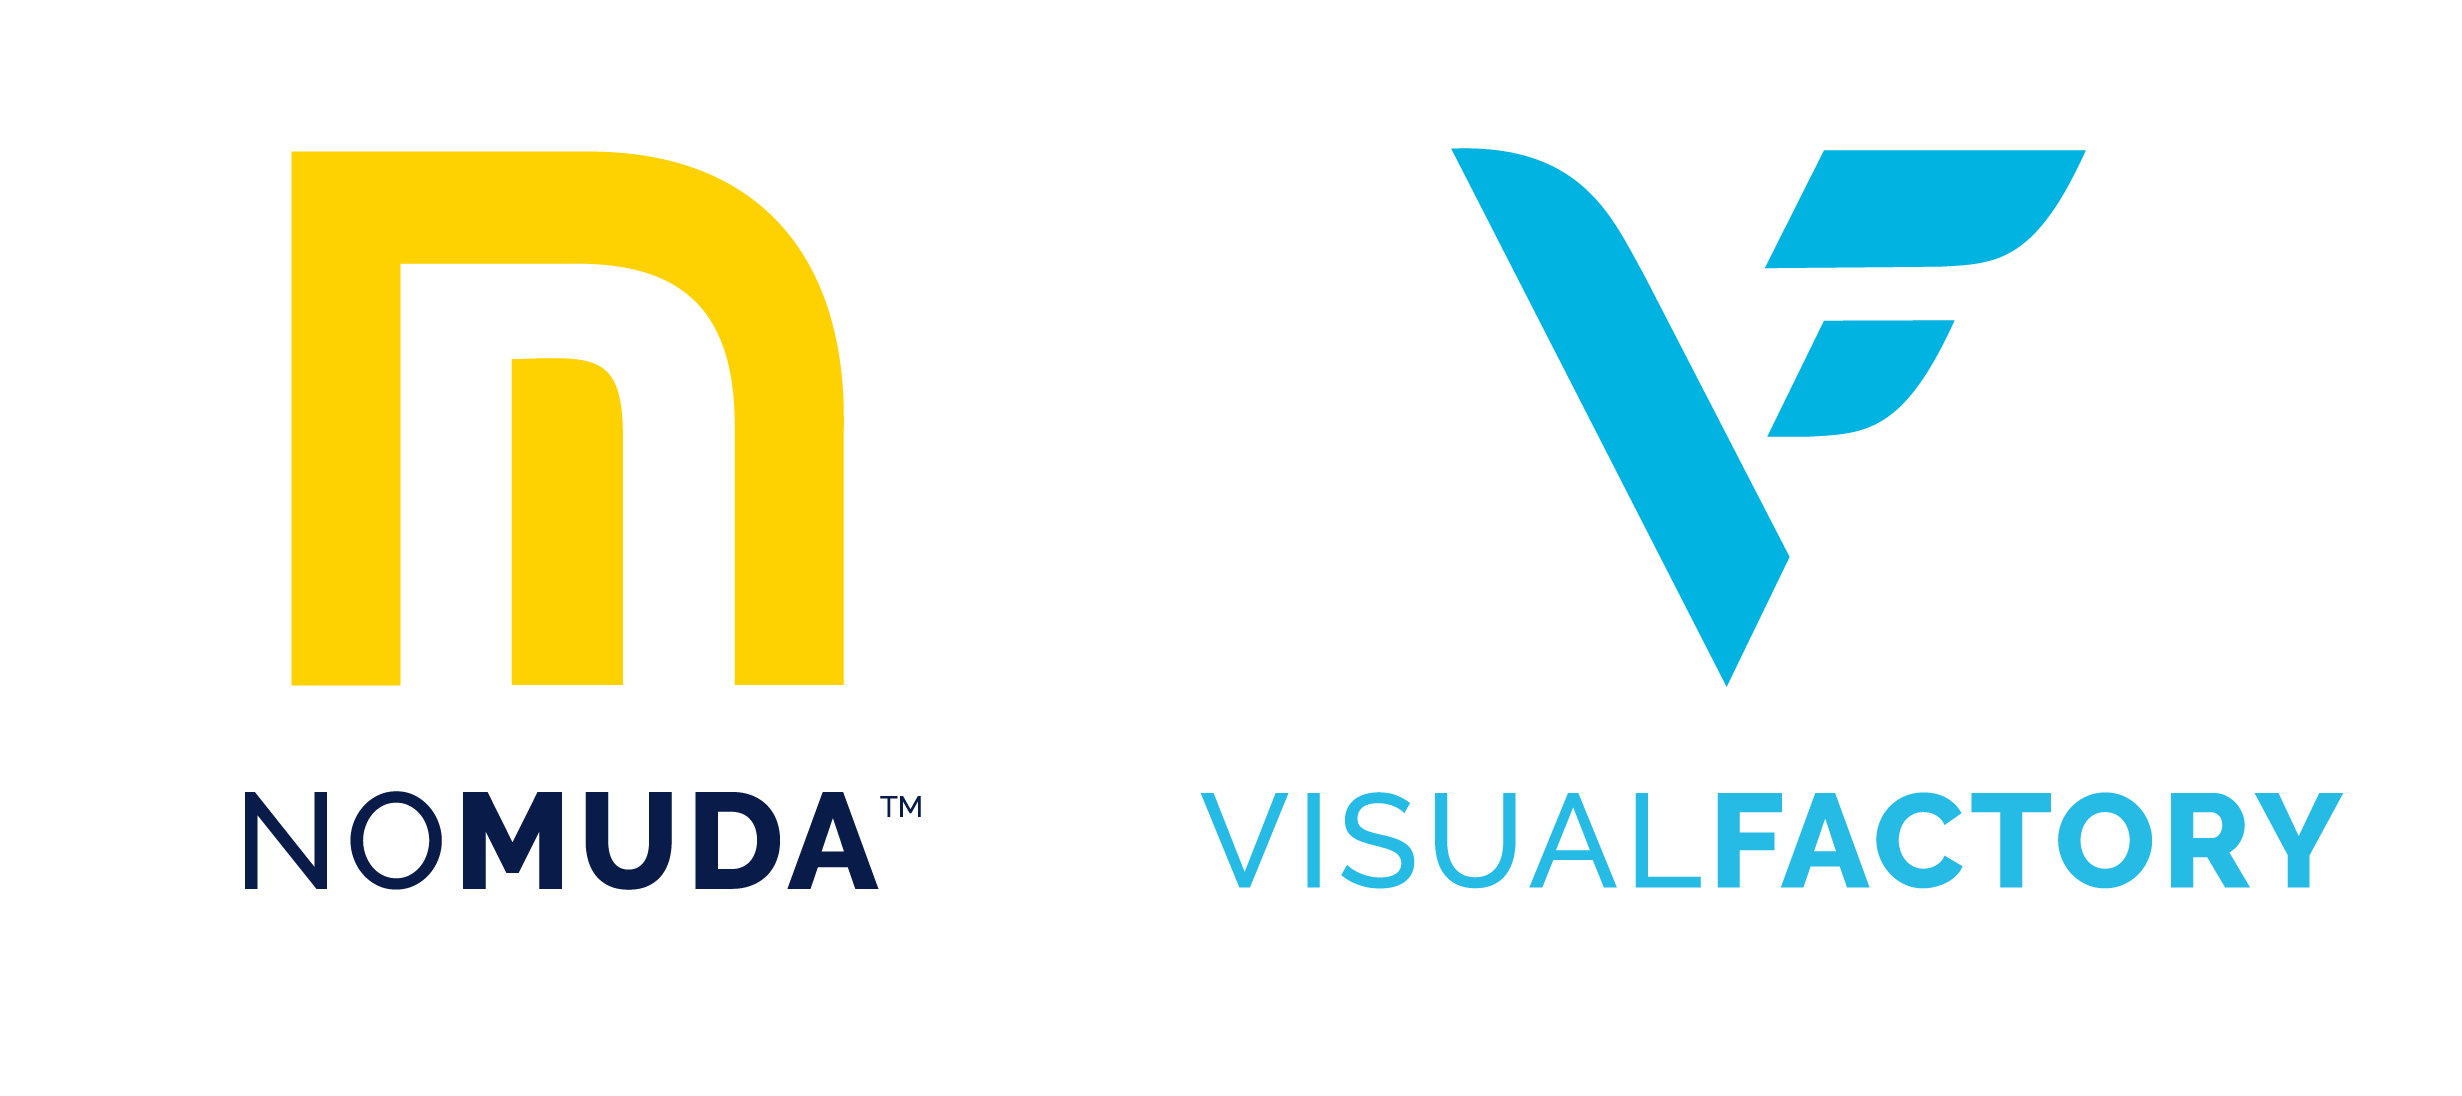 NoMuda VisualFactory logos